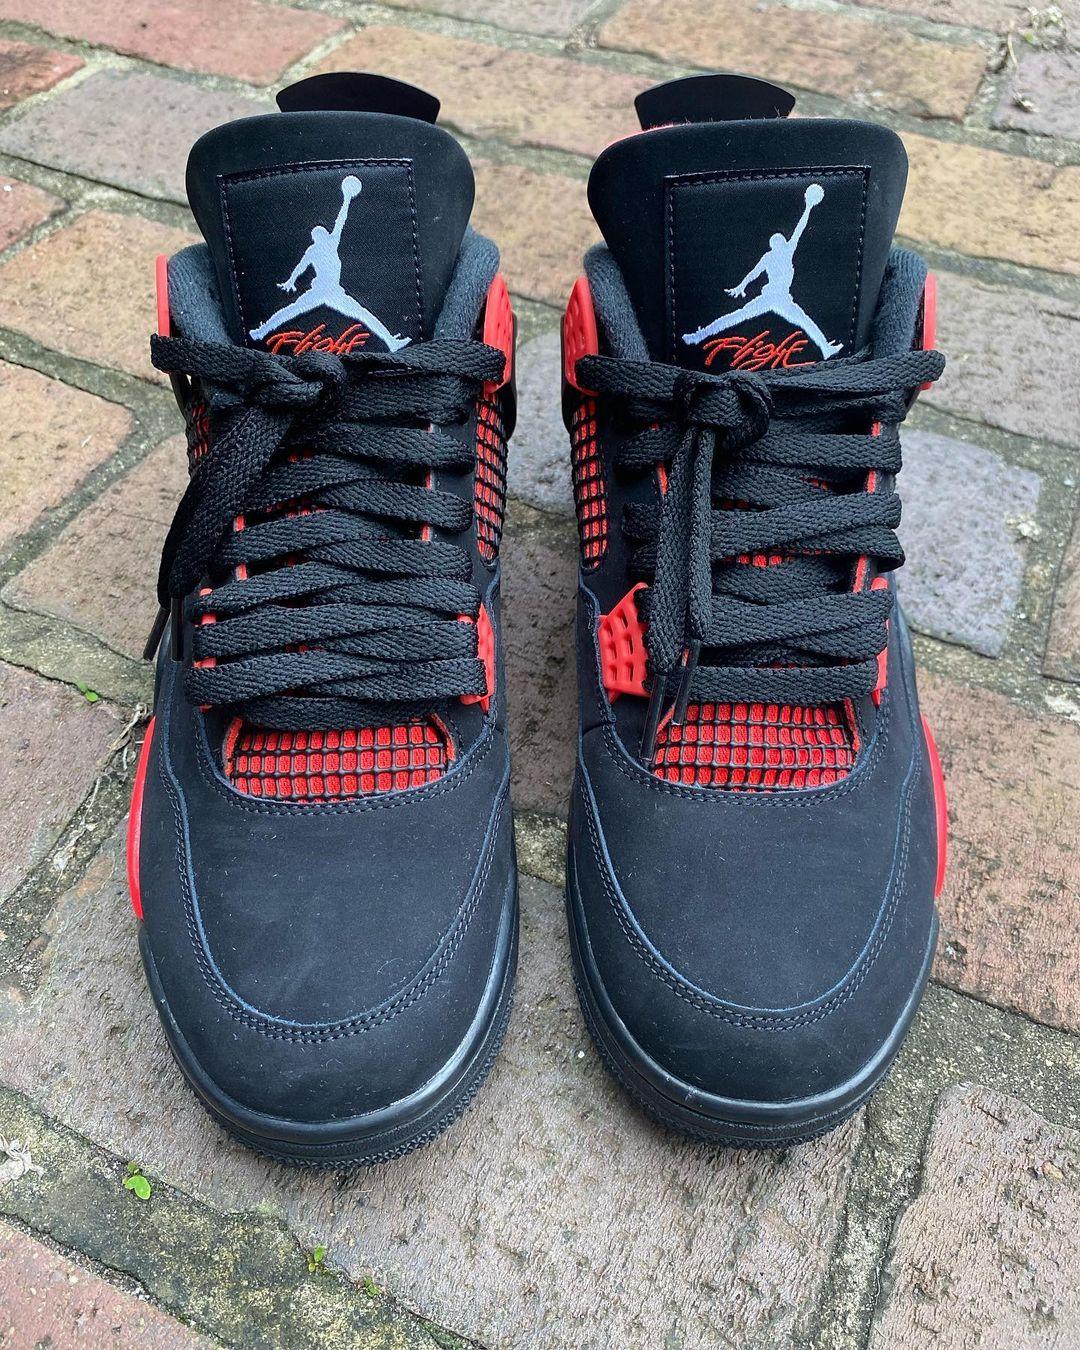 Air Jordan 4,AJ4,发售,CT8527-016  酷似雷公配色!全新黑红 AJ4 实物曝光!这质感真不错!